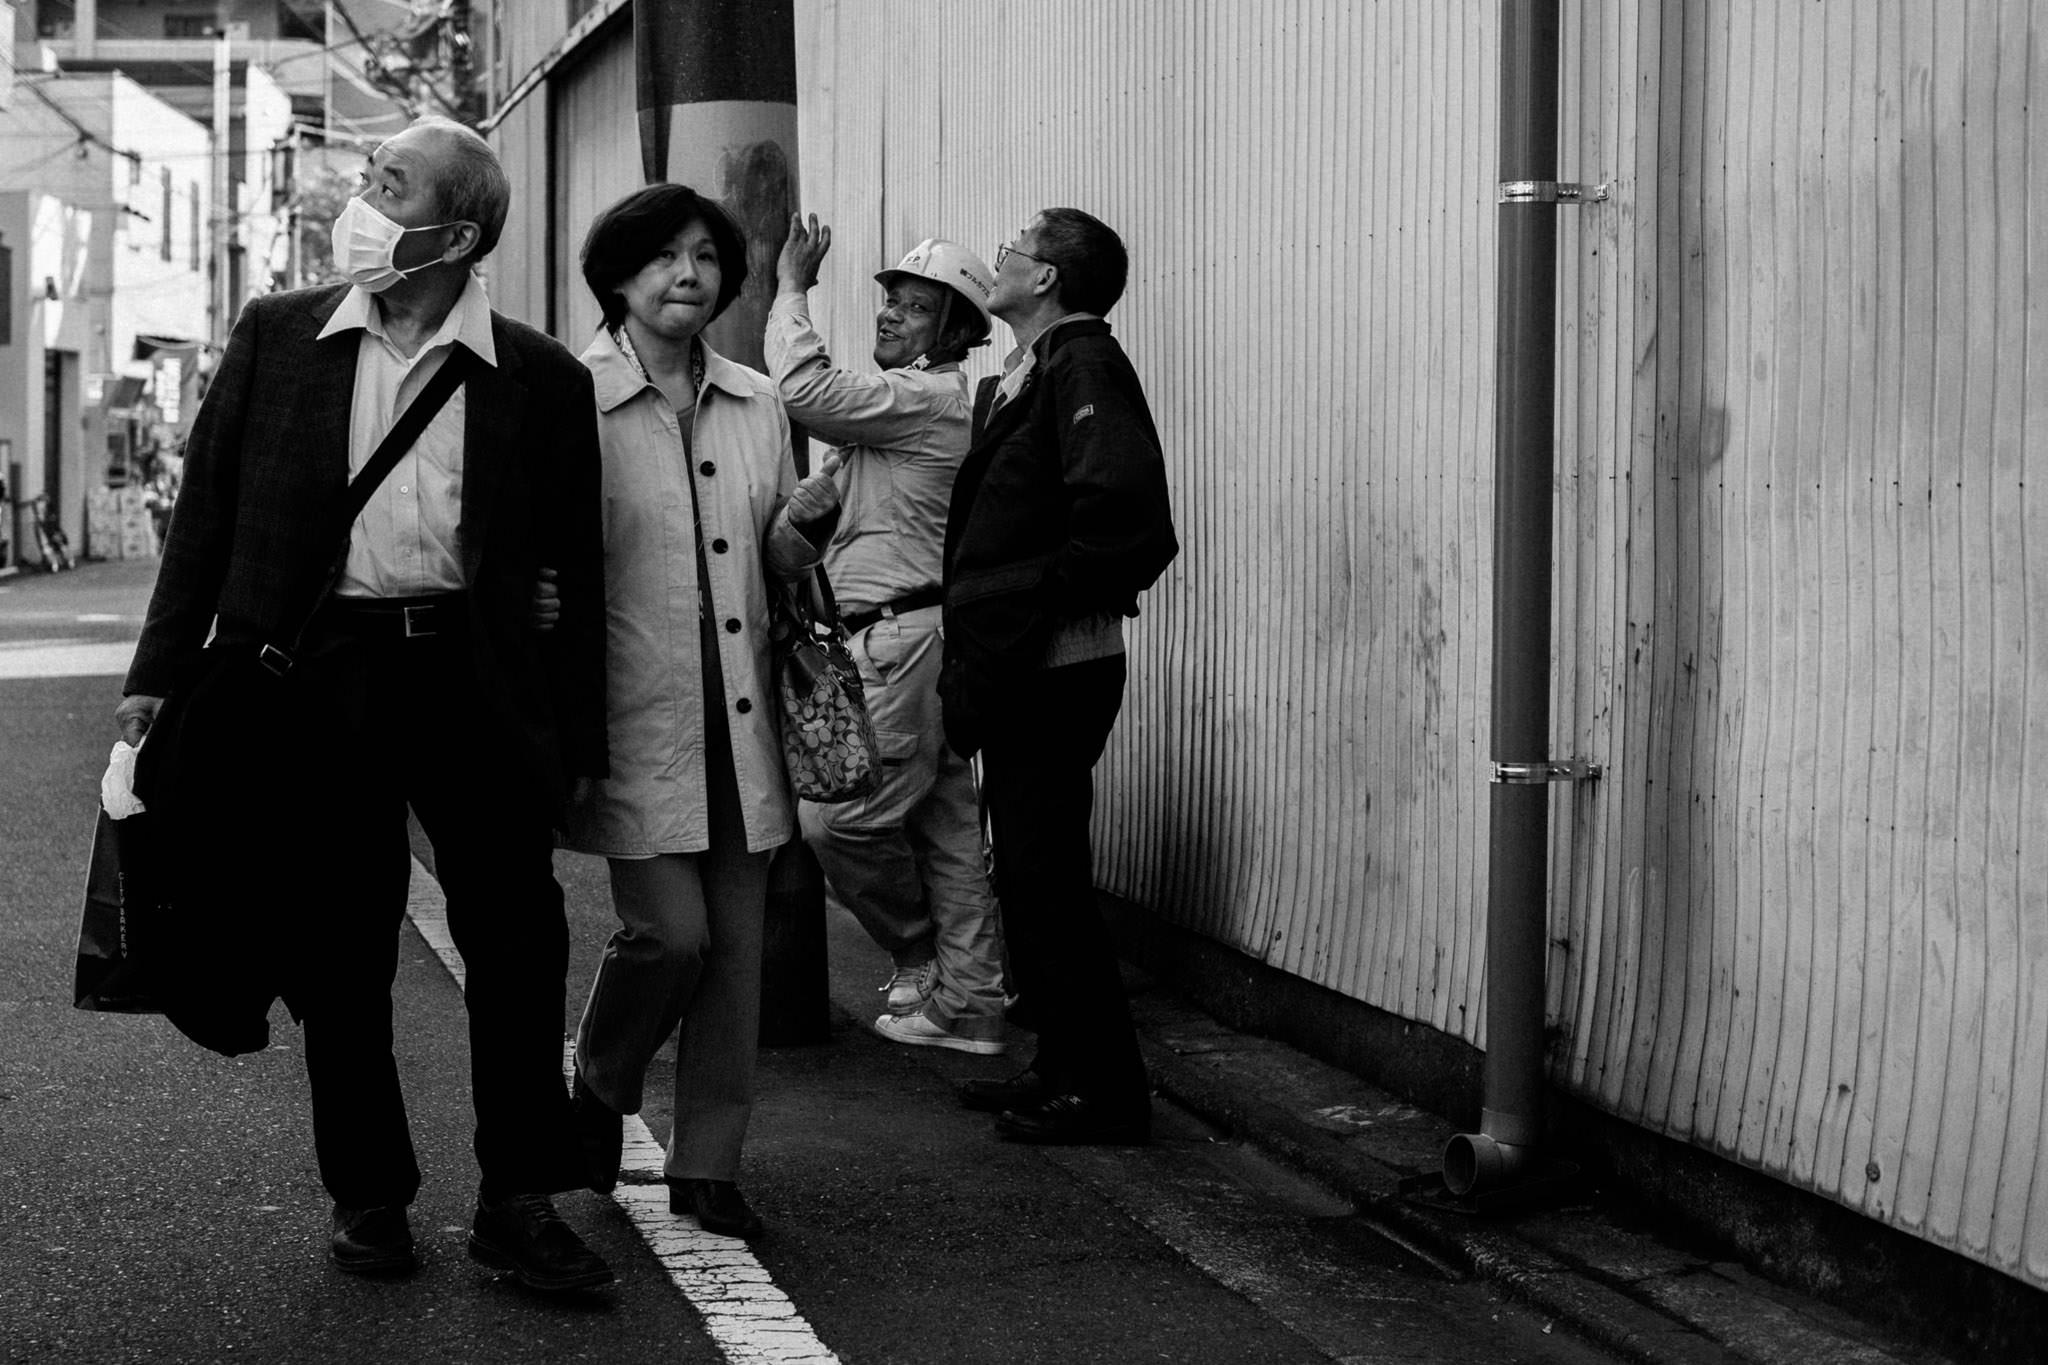 chris_eberhardt_japan_travel_reise_nippon-24.jpg